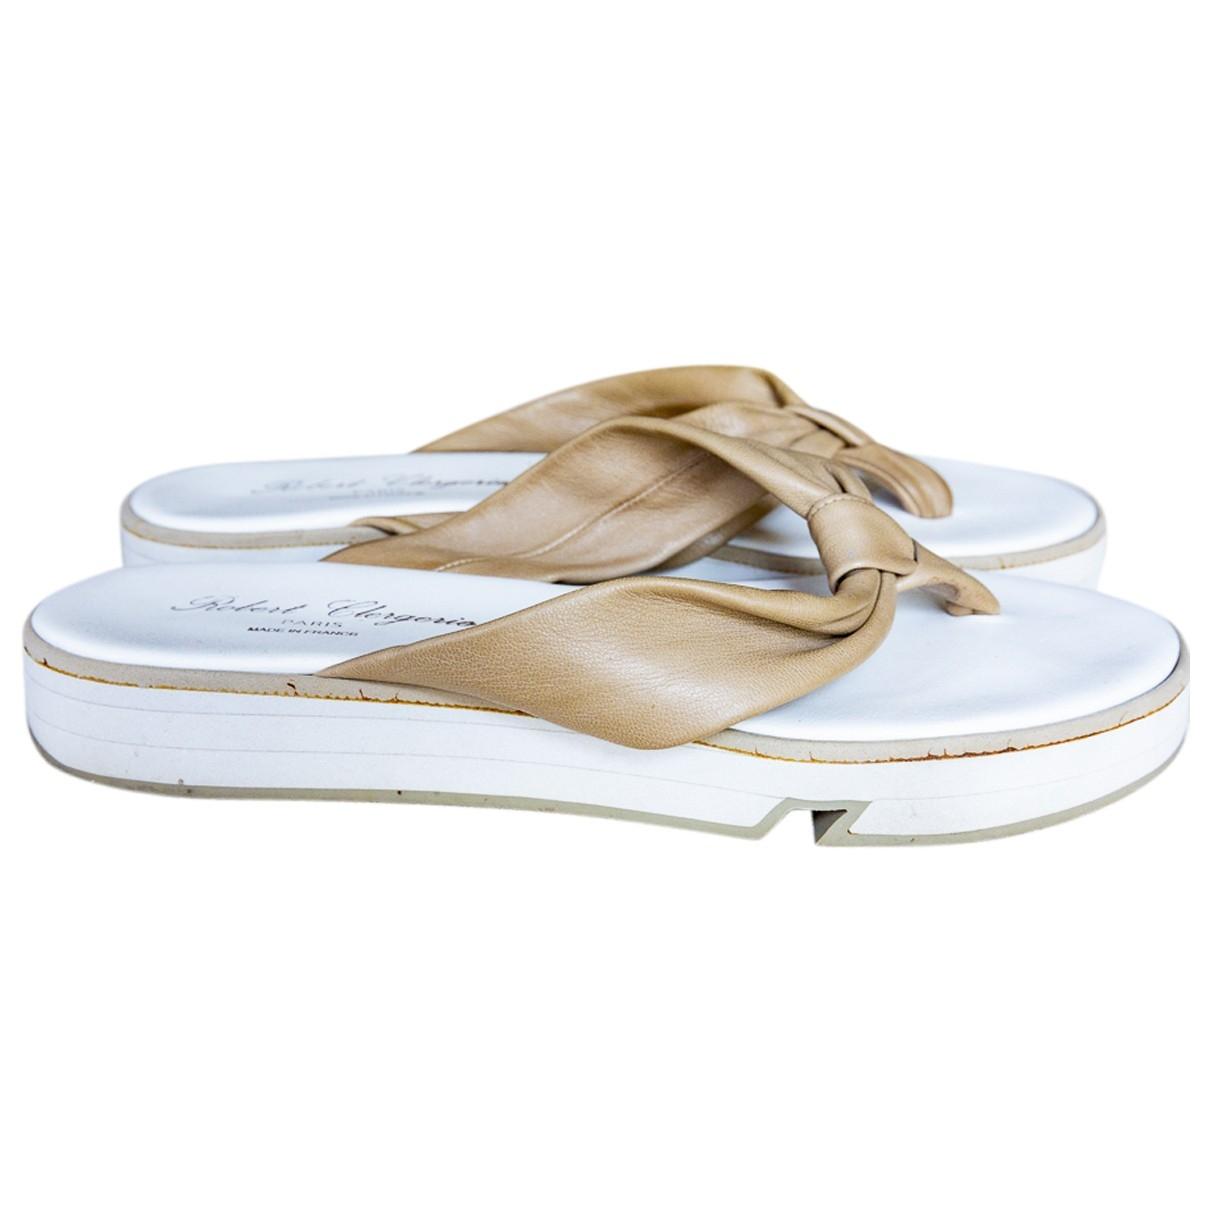 Robert Clergerie \N Beige Leather Sandals for Women 40.5 EU